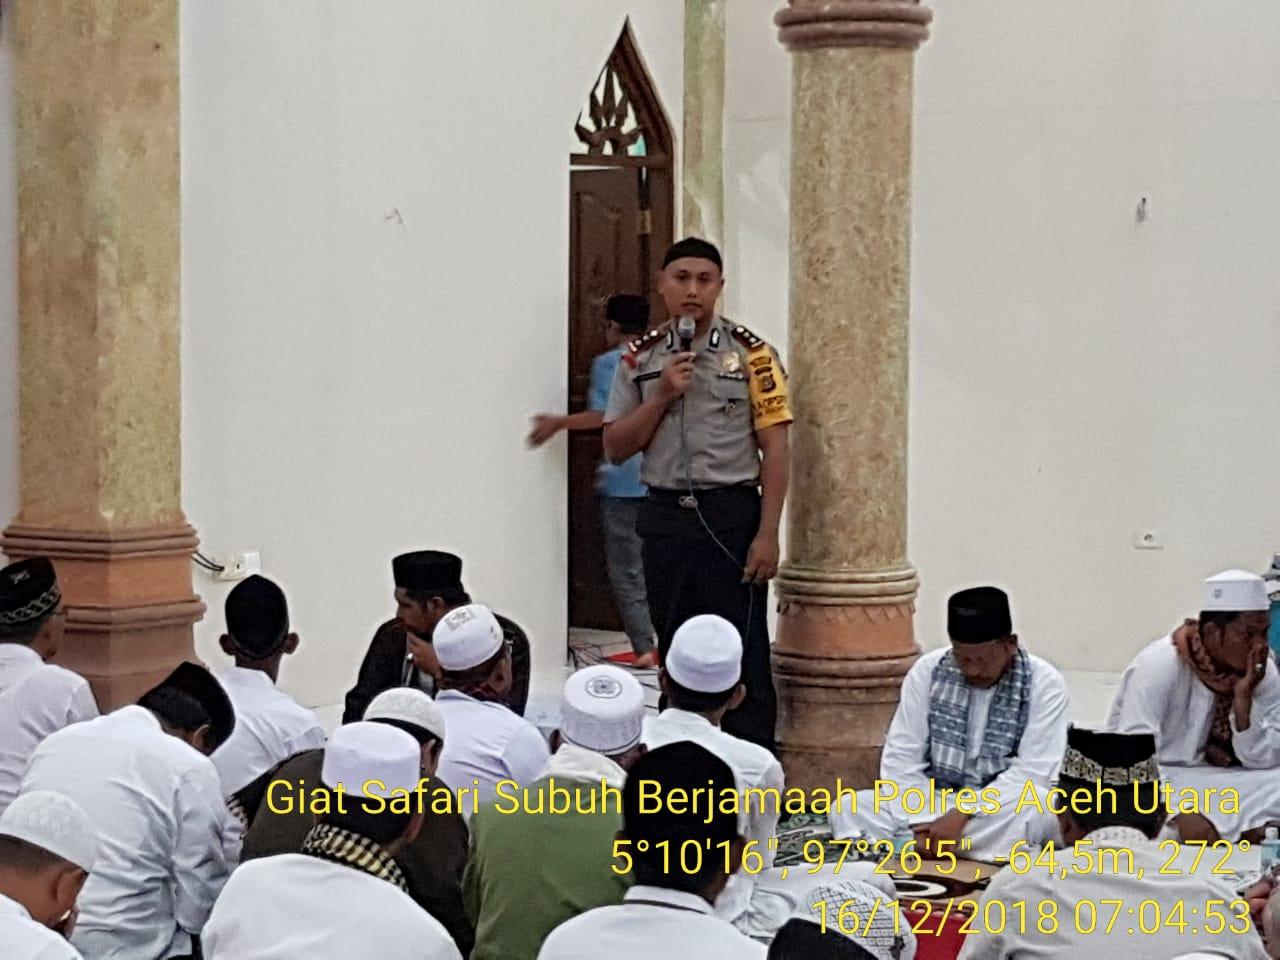 Kapolres Aceh Utara Gelar Safari Subuh di Masjid Baiturrahim Abu Keumala